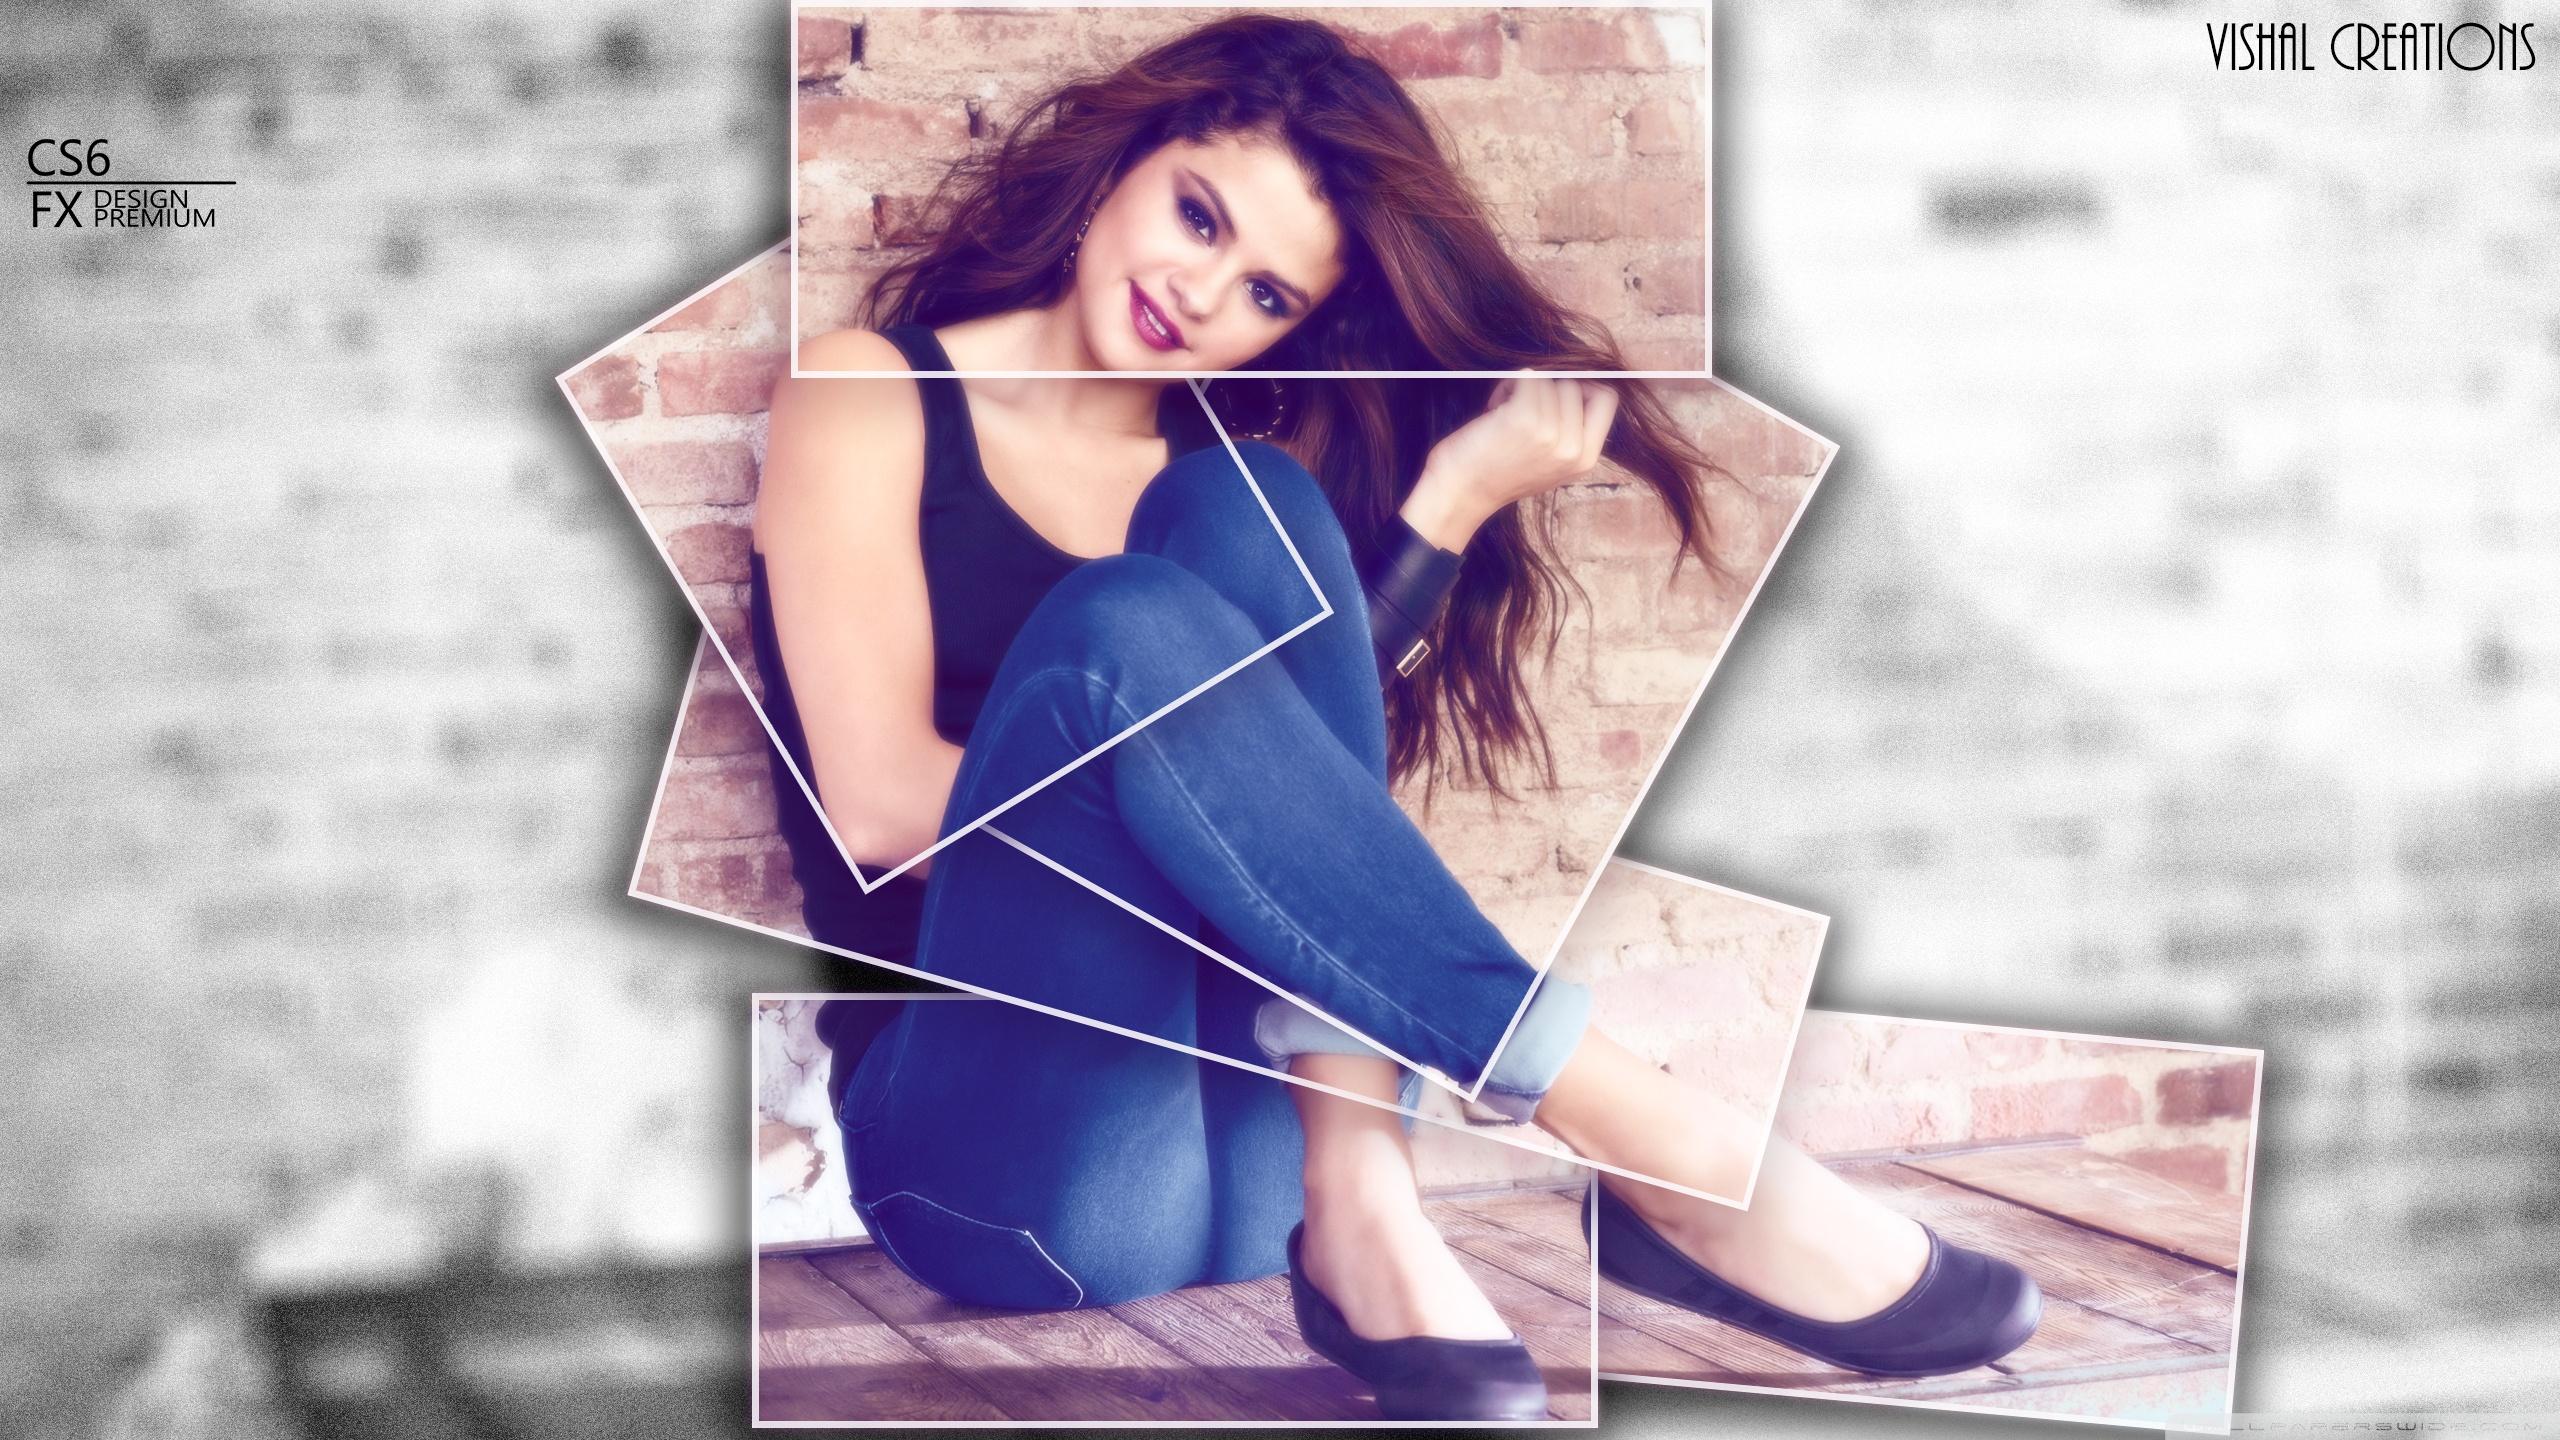 WallpapersWidecom Selena Gomez HD Desktop Wallpapers for 4K 2560x1440